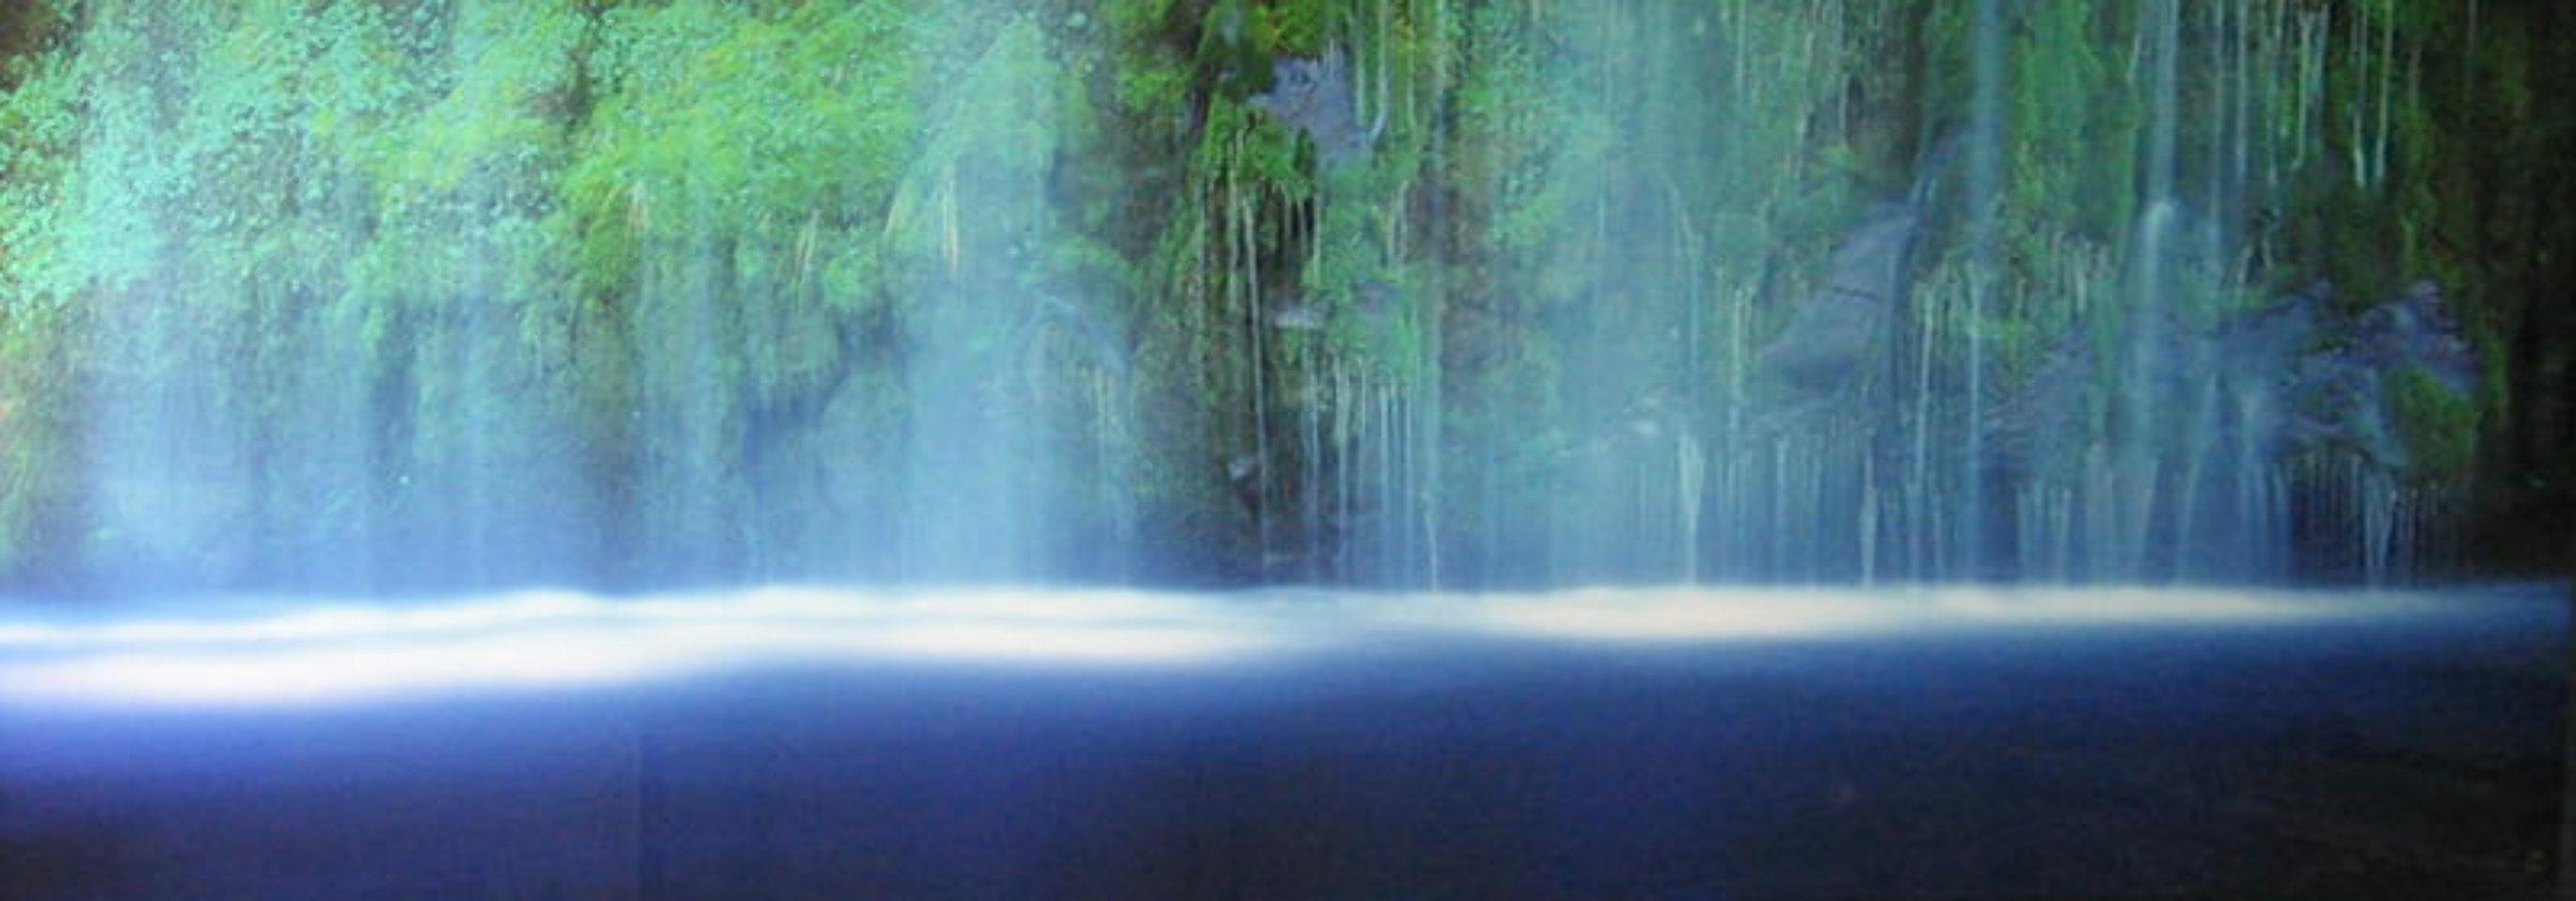 Tranquility  (Mossbrae Falls, California) 1.5M Huge Panorama by Peter Lik